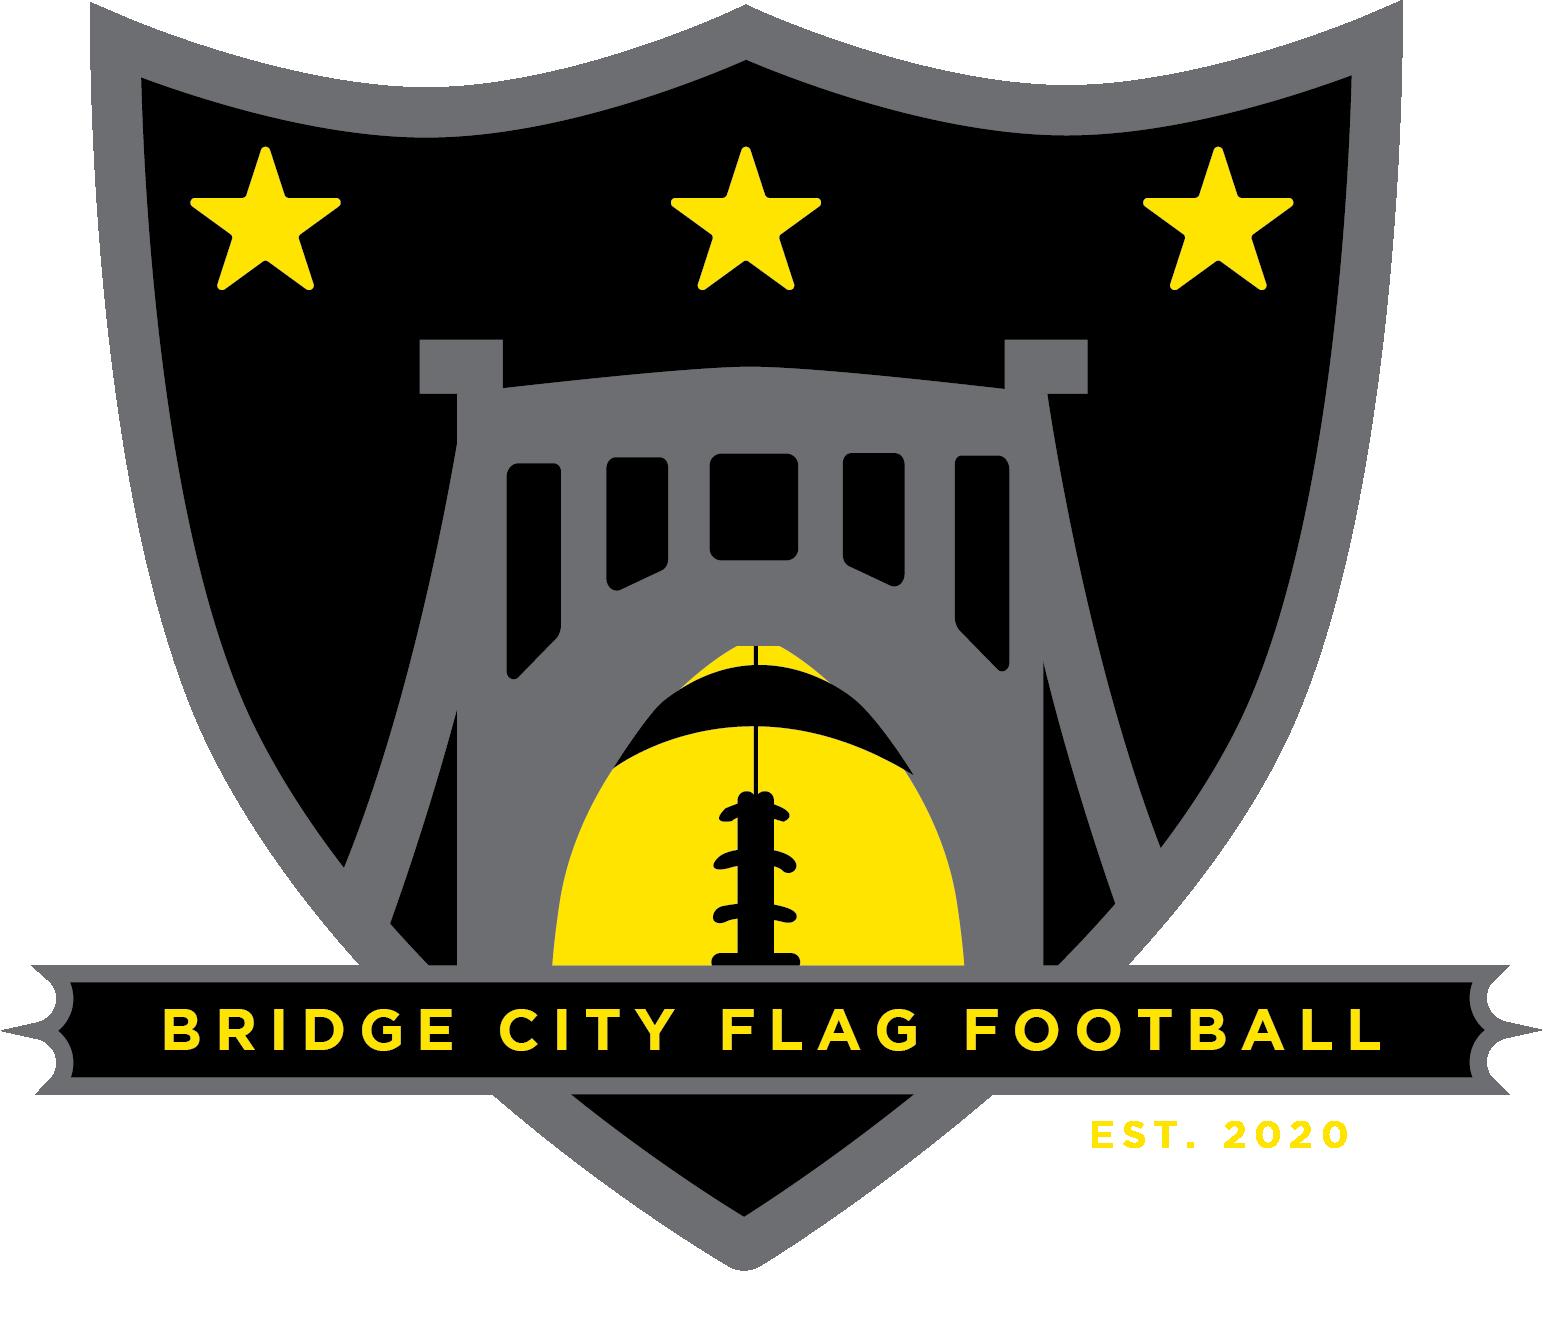 Bridge City Flag Football